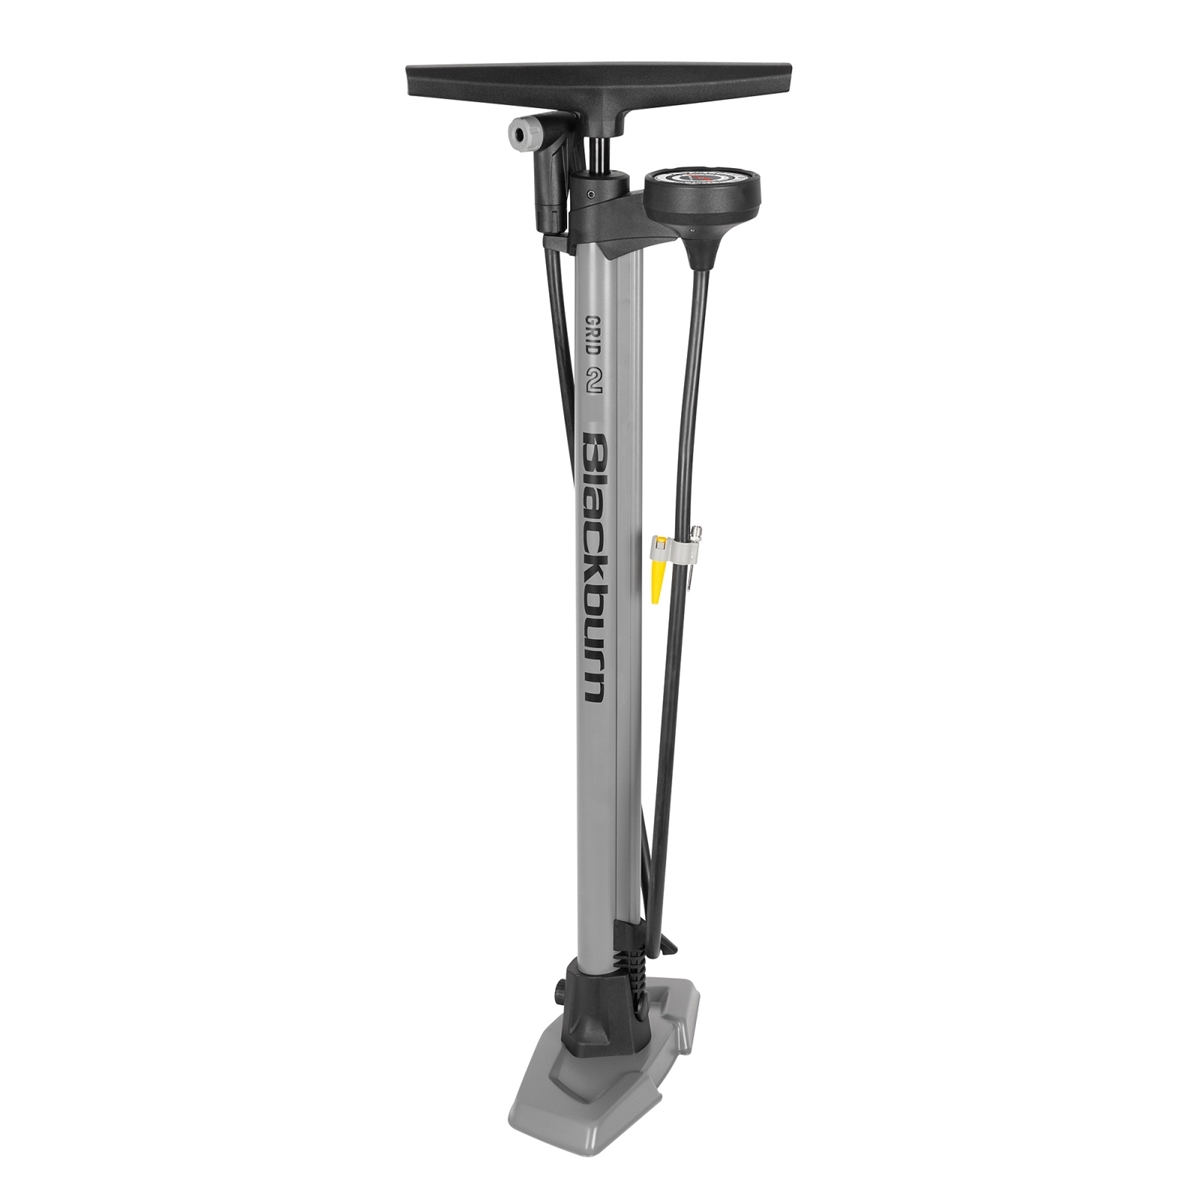 Pompa Officina Grid 2 11 bar / 160 psi Grigio